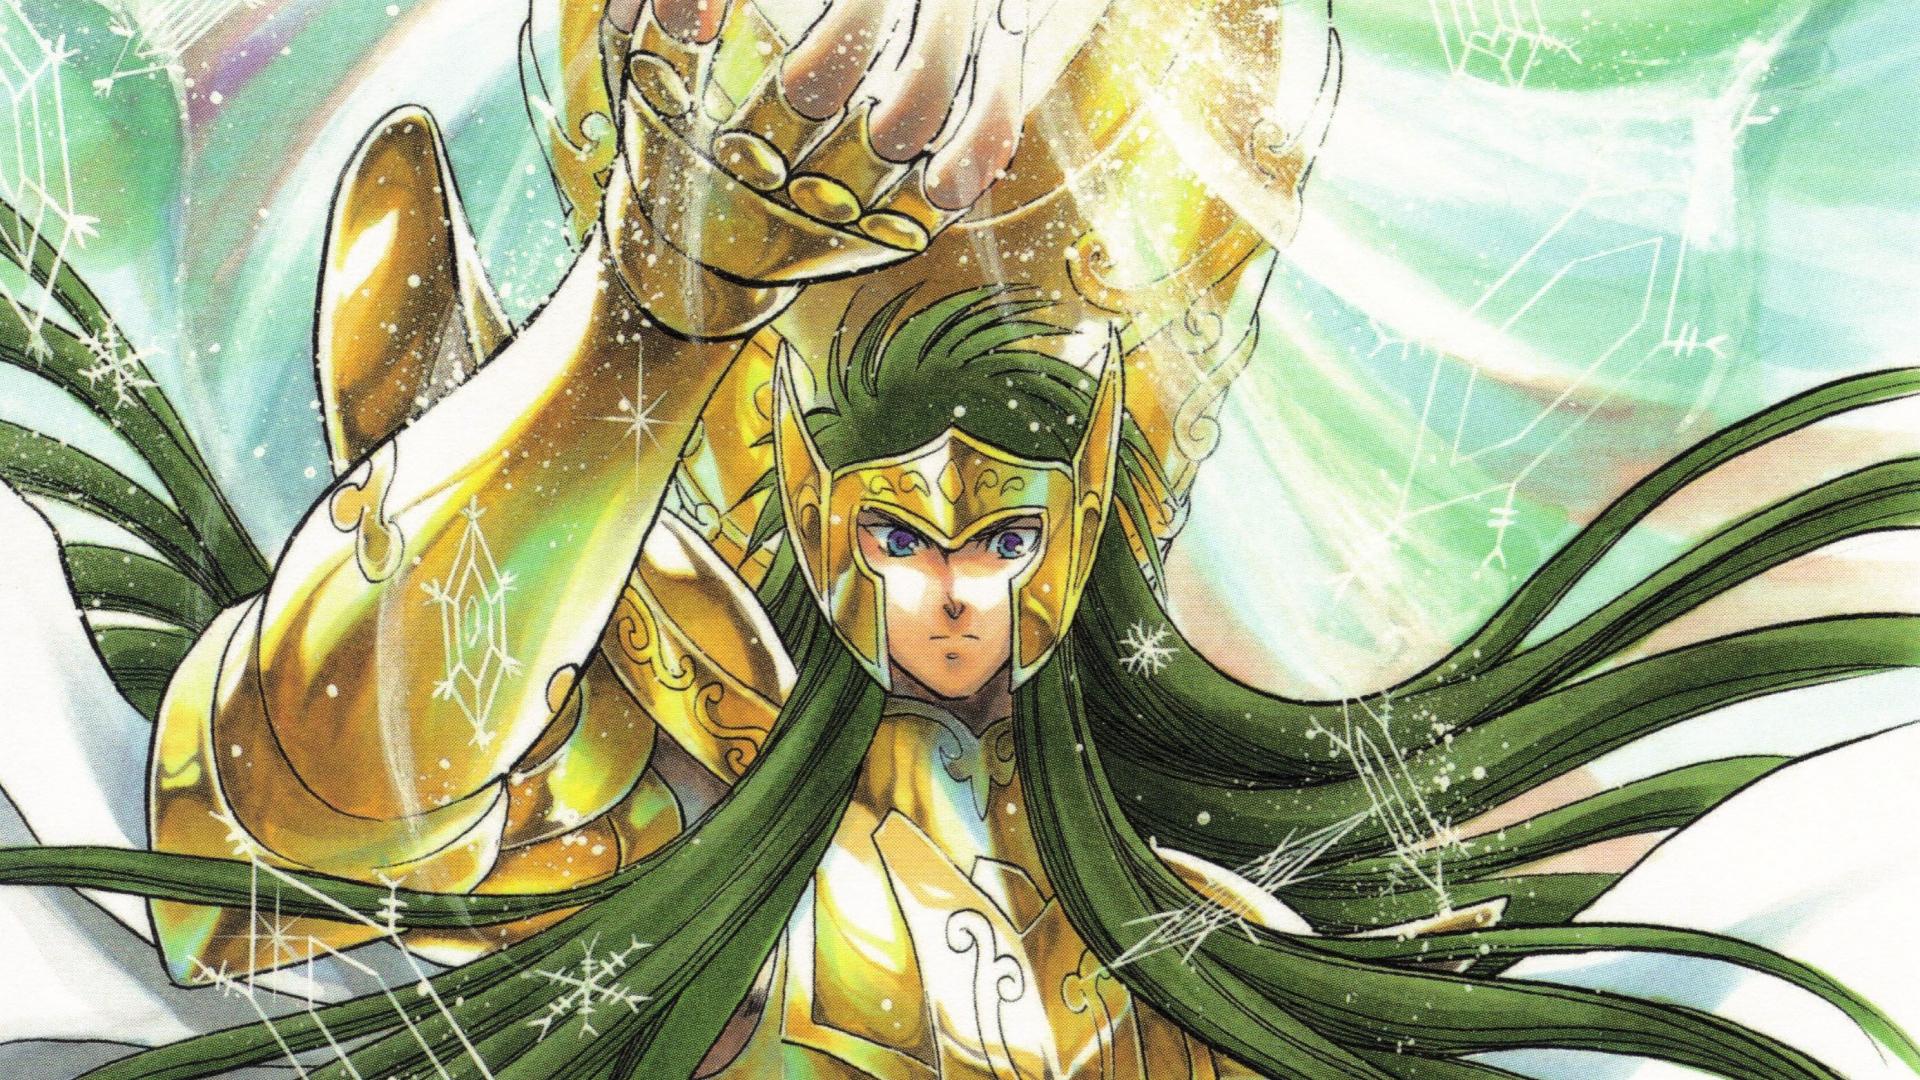 Free Download Saint Seiya The Lost Canvas Wallpaper Saint Seiya